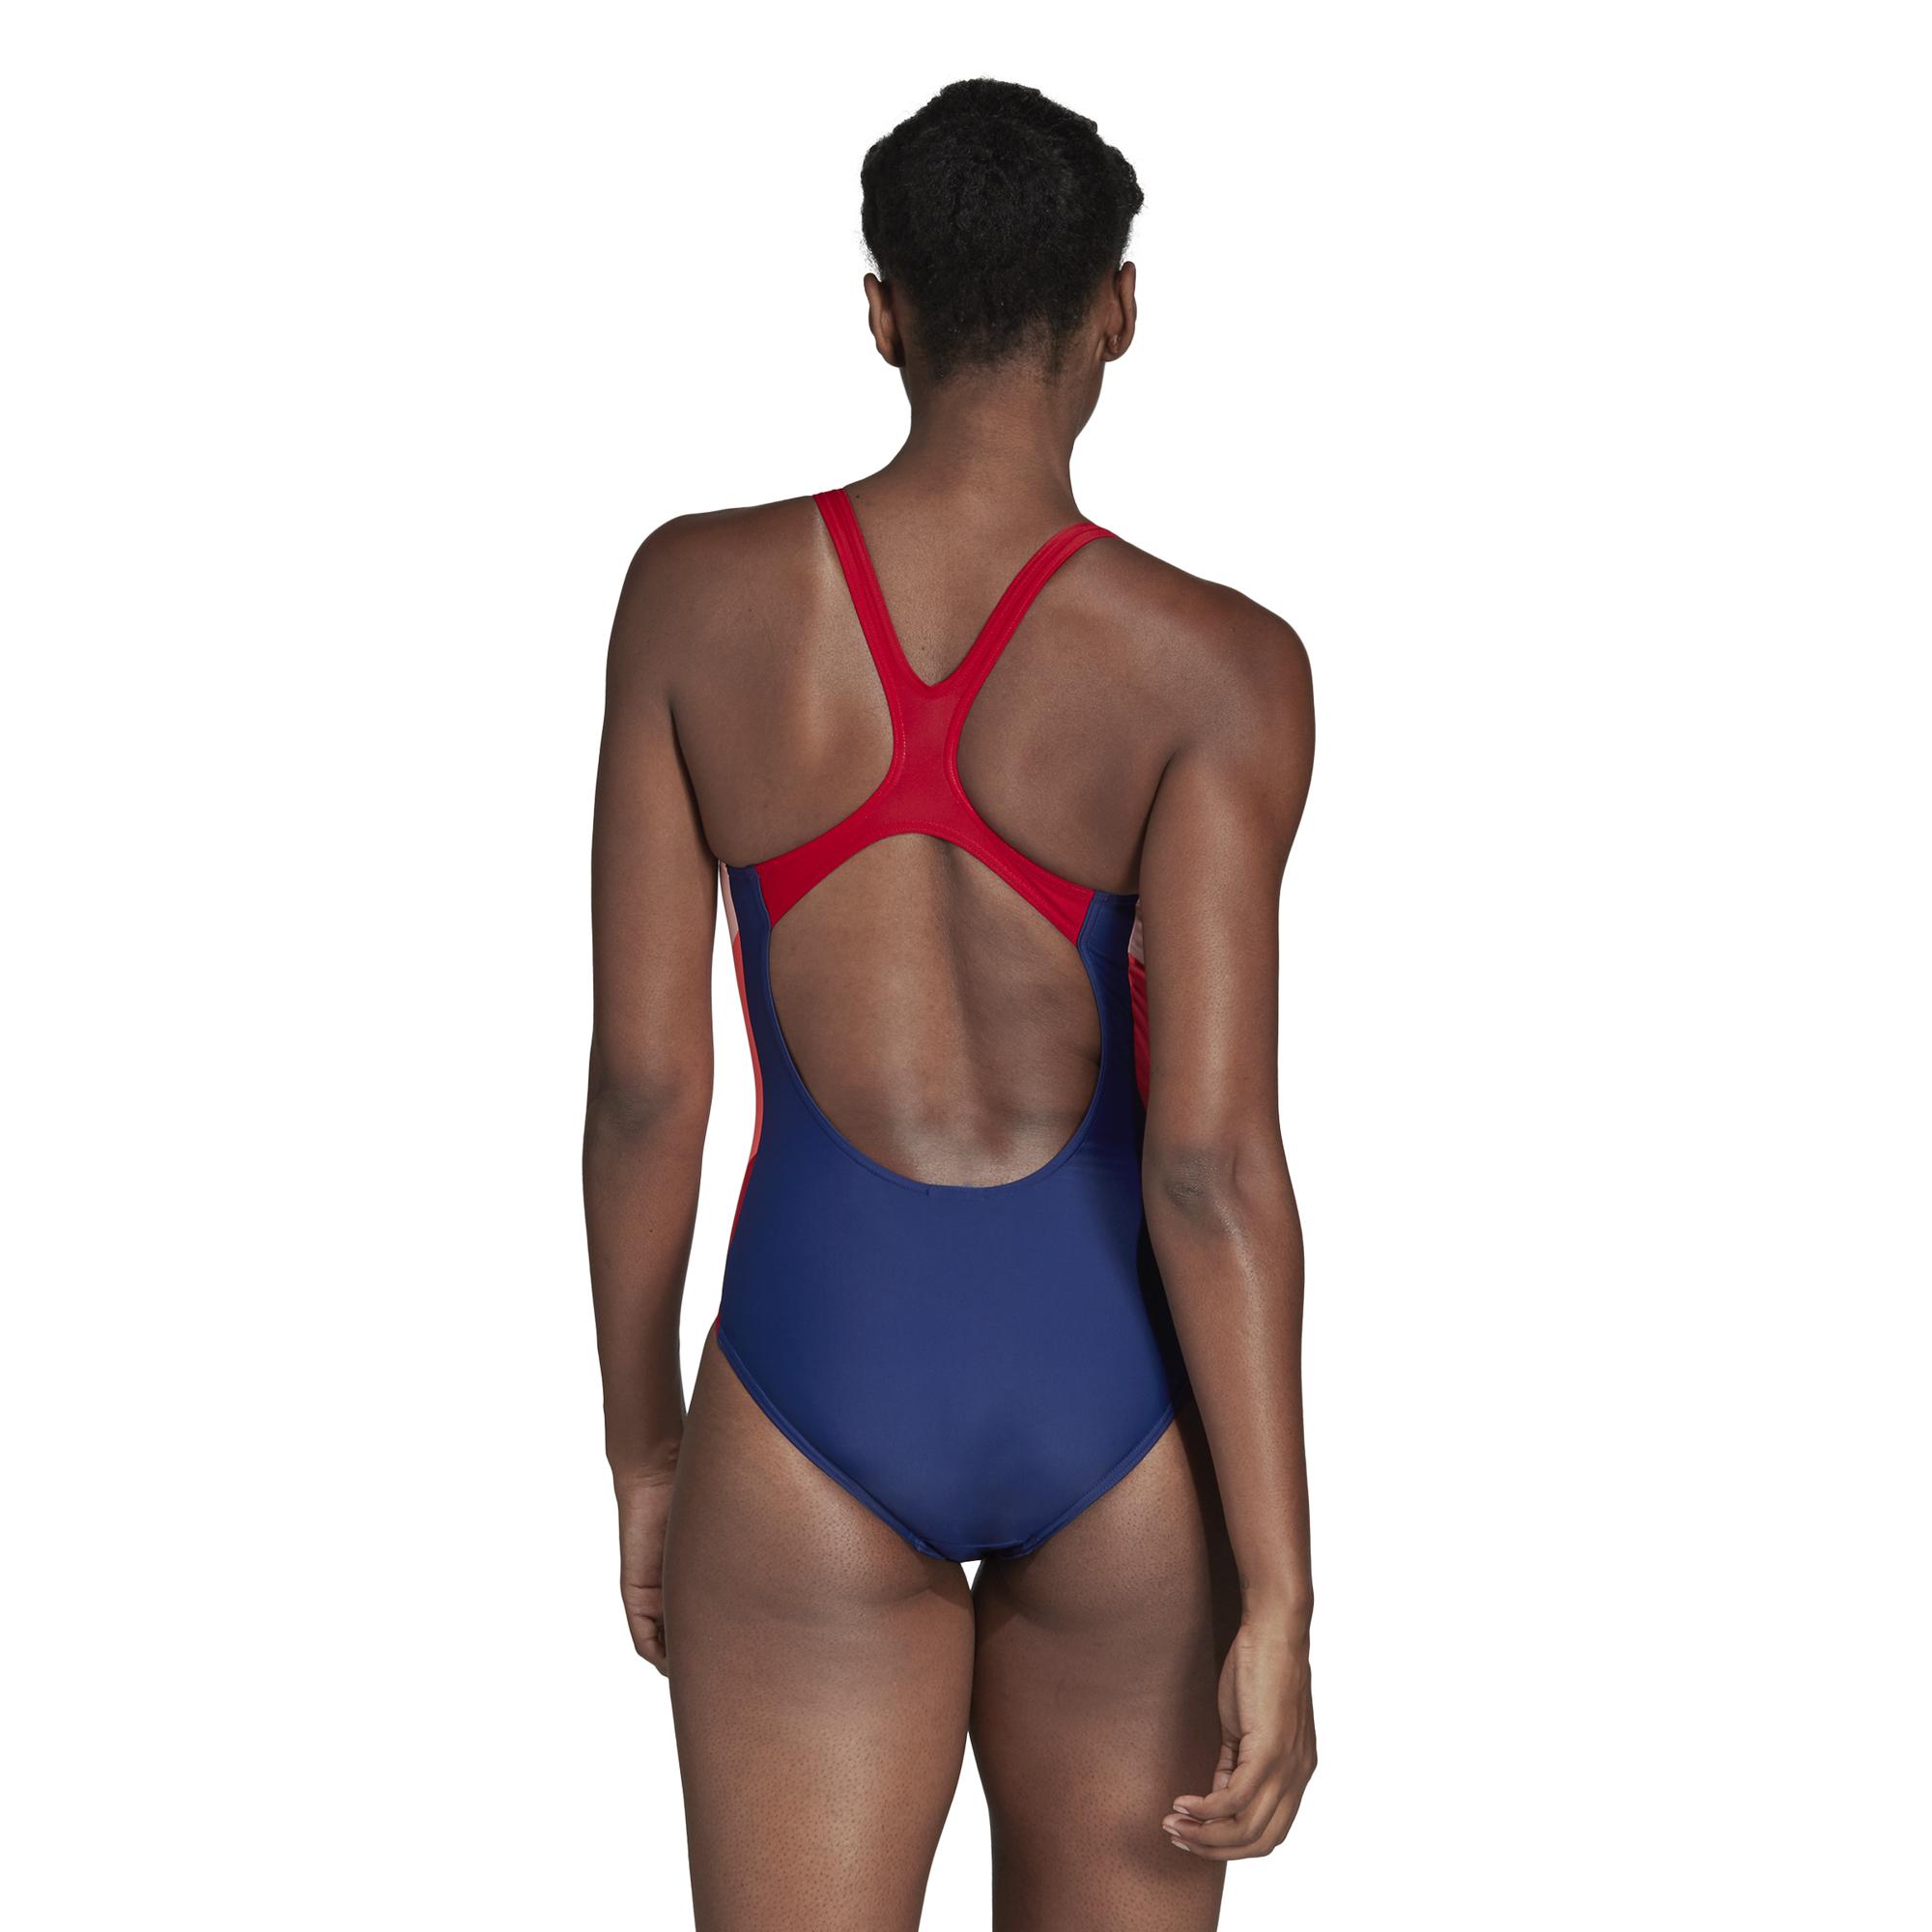 0073da1521775 ... strój kąpielowy adidas Athly X Colorblock Swimsuit DH2389 ...